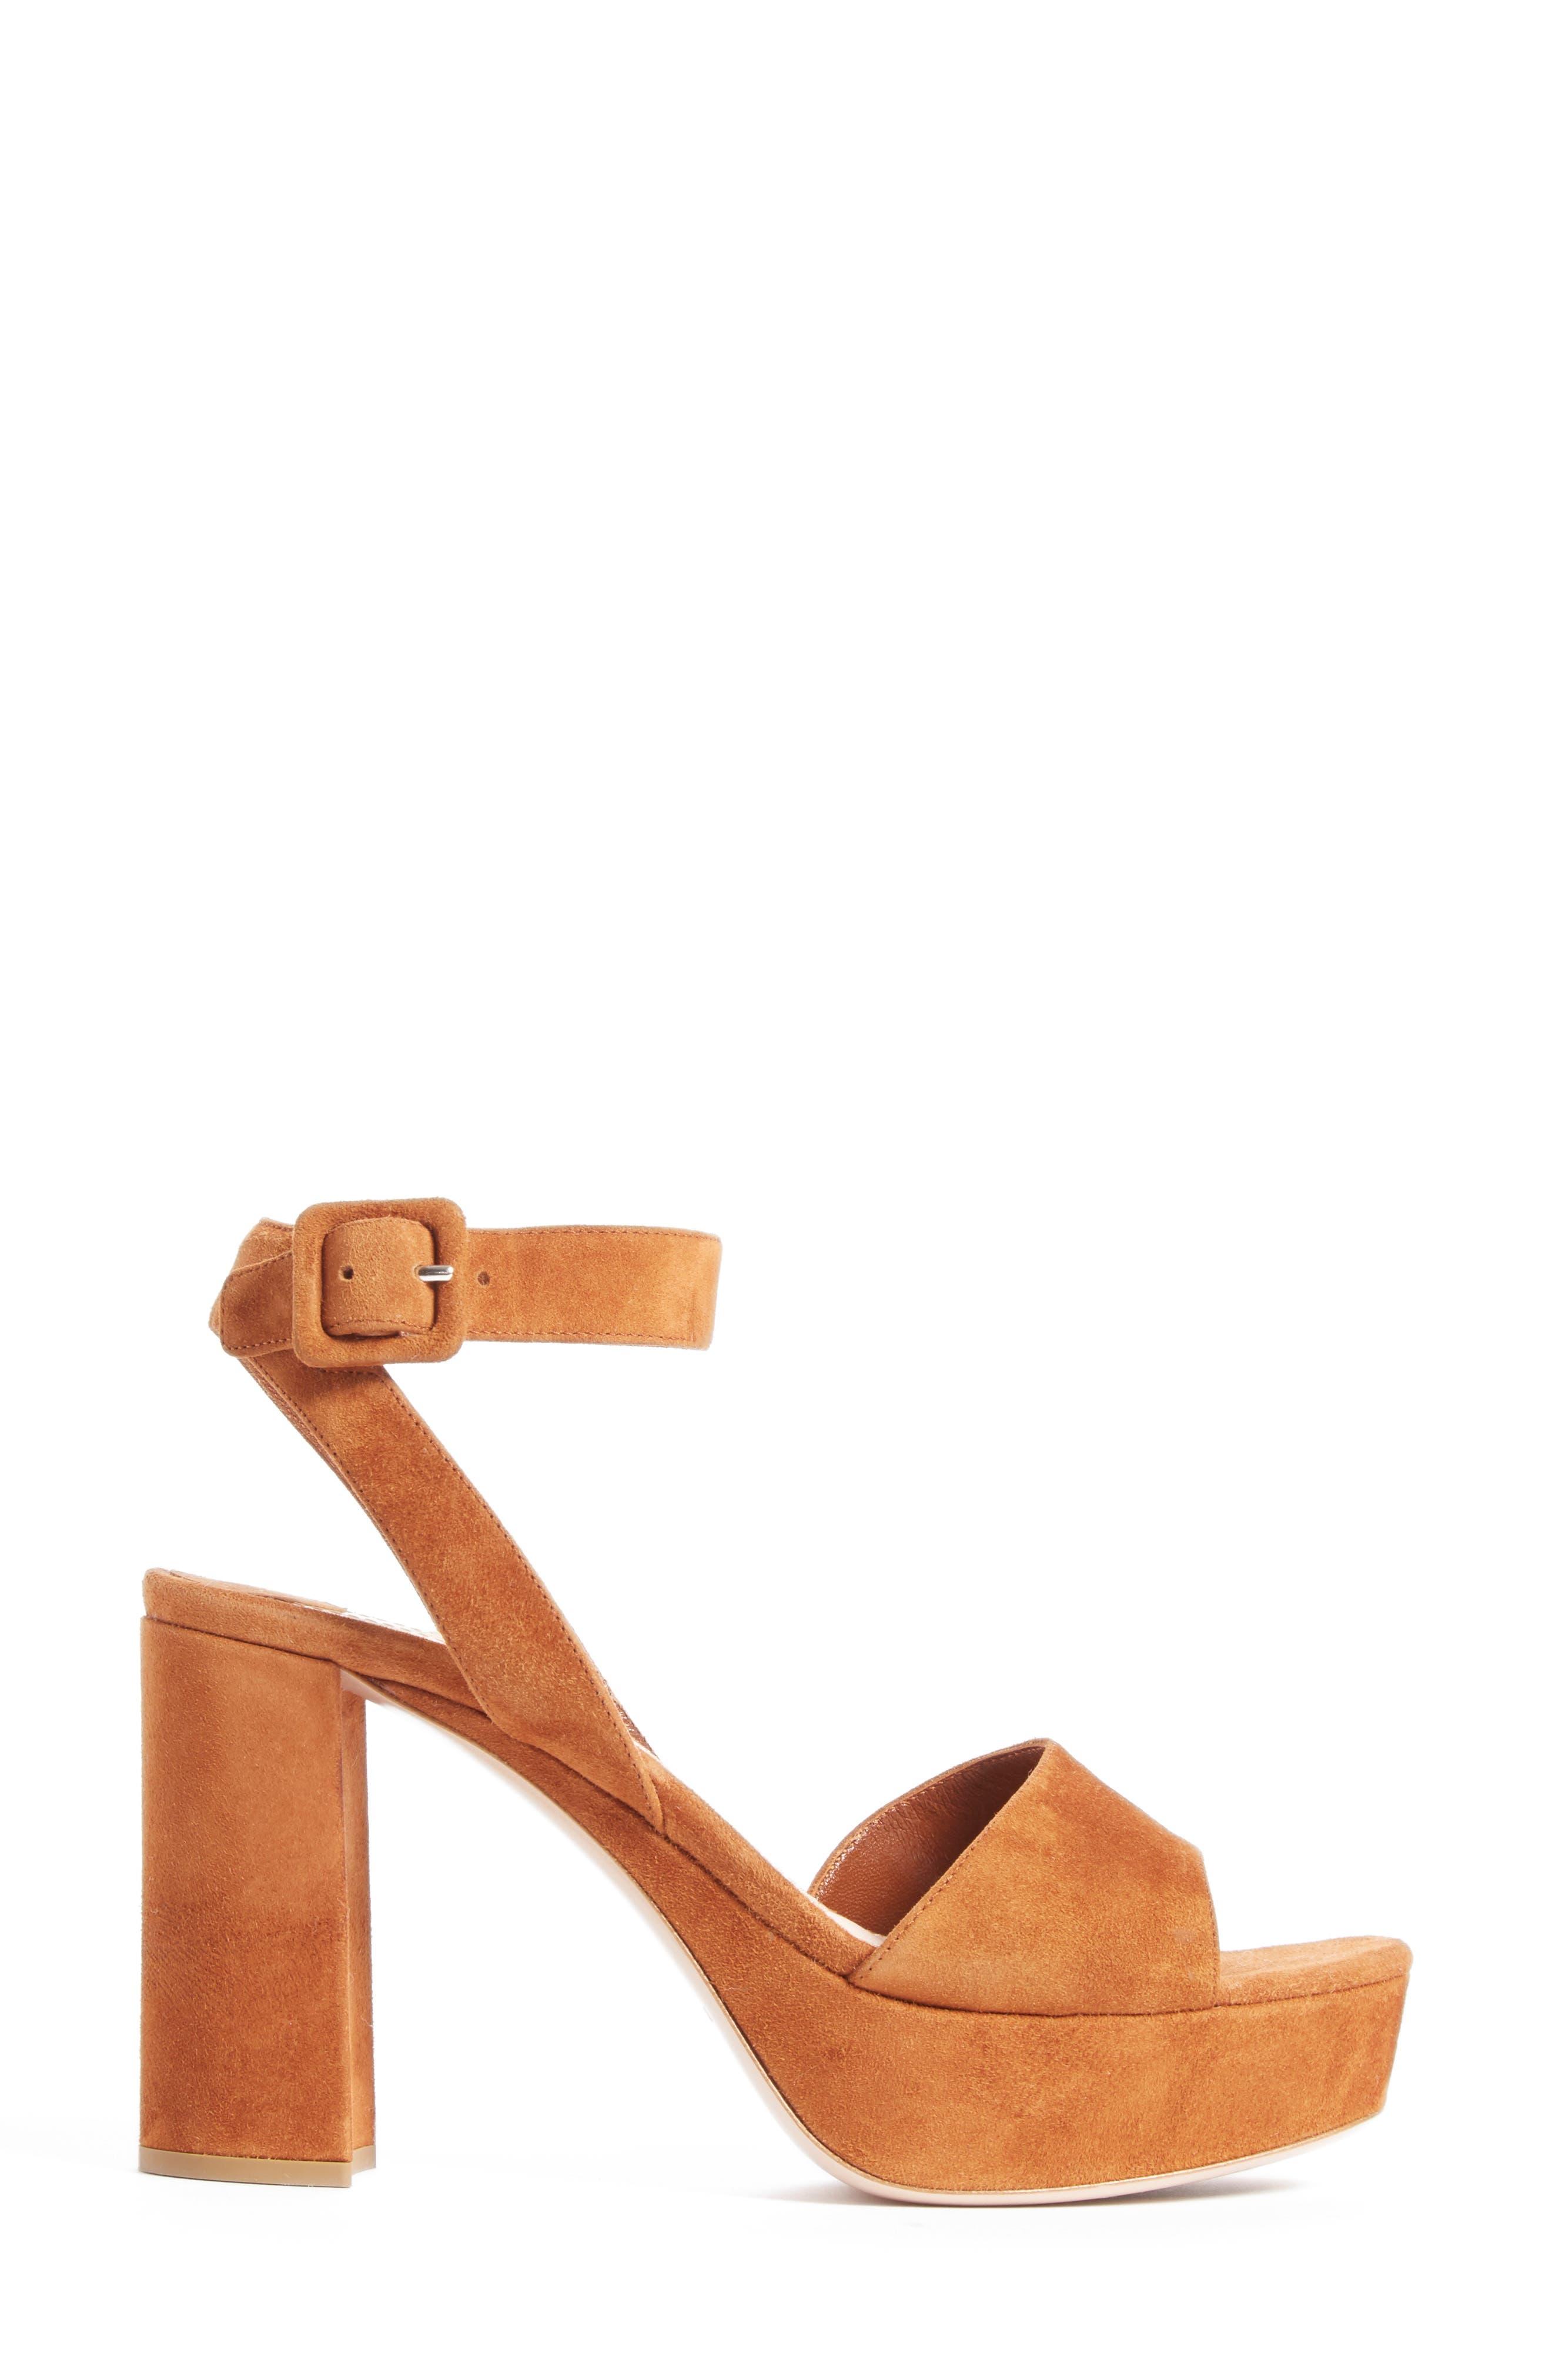 'Sandali' Ankle Strap Sandal,                             Alternate thumbnail 5, color,